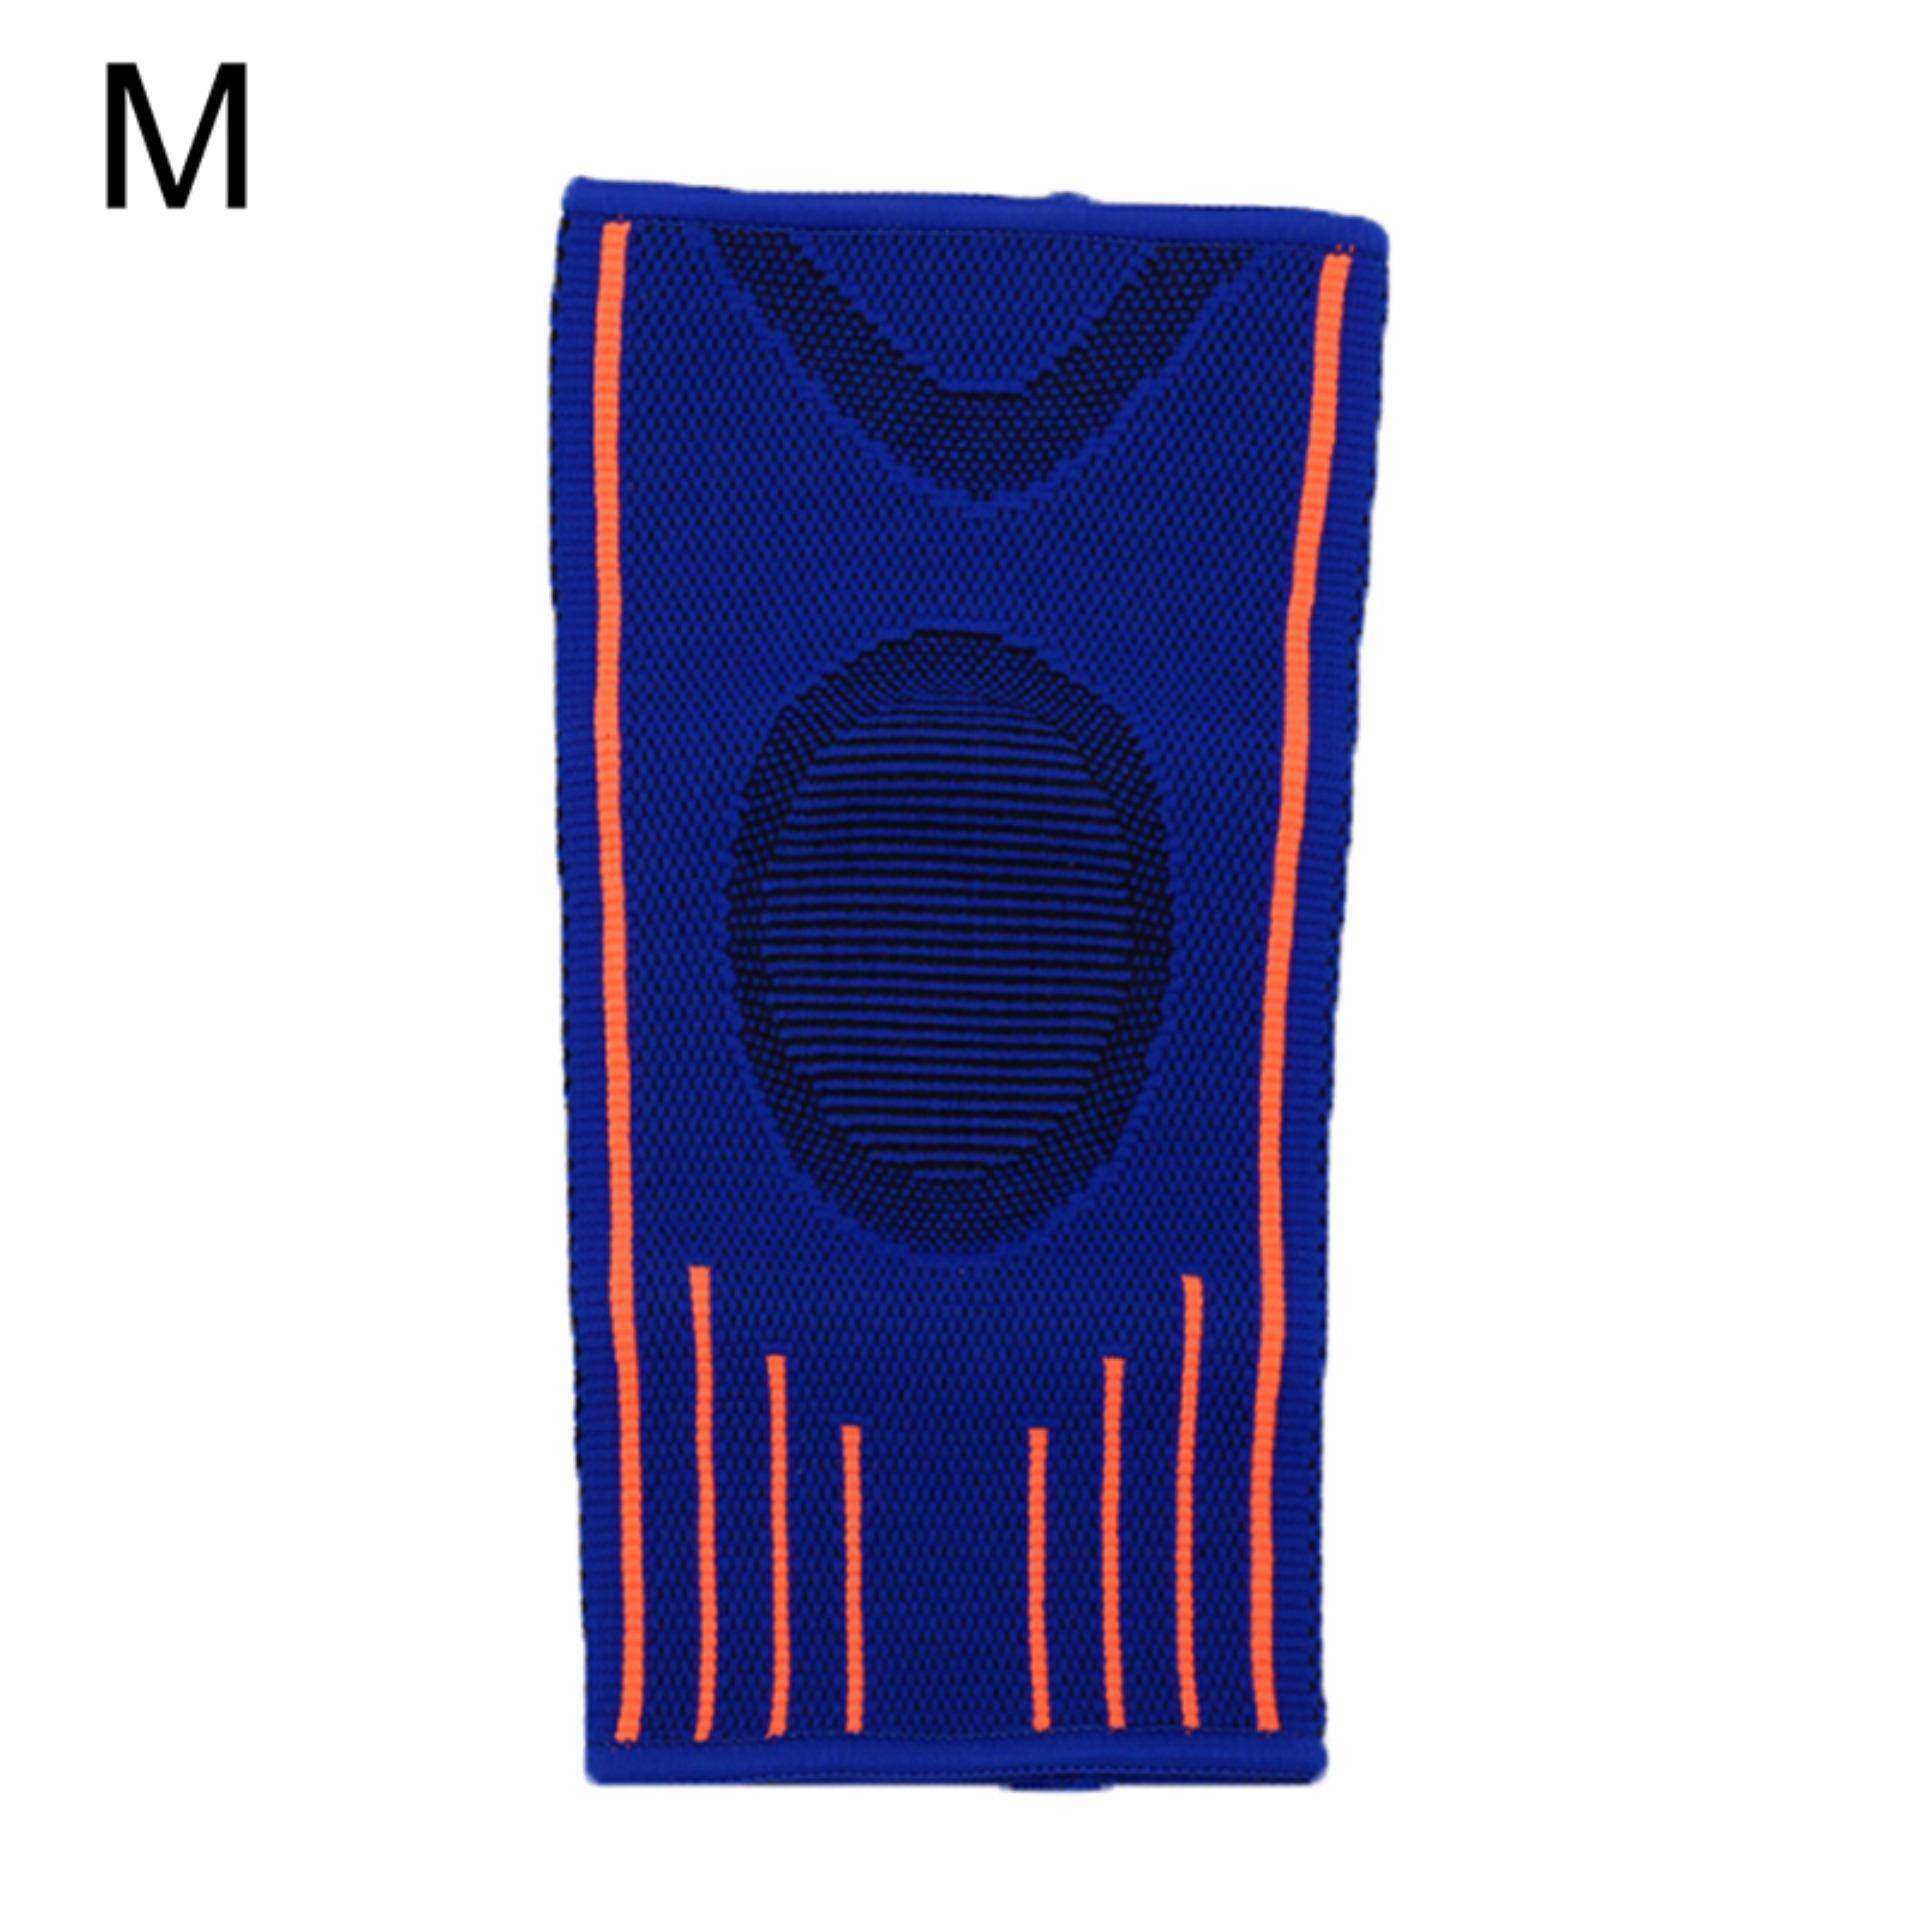 Nylon elbow brace sleeve elbow pads for sports absorb sweat elbow protection SizeM:23cm x 13.5cm x 11.5cm - intl